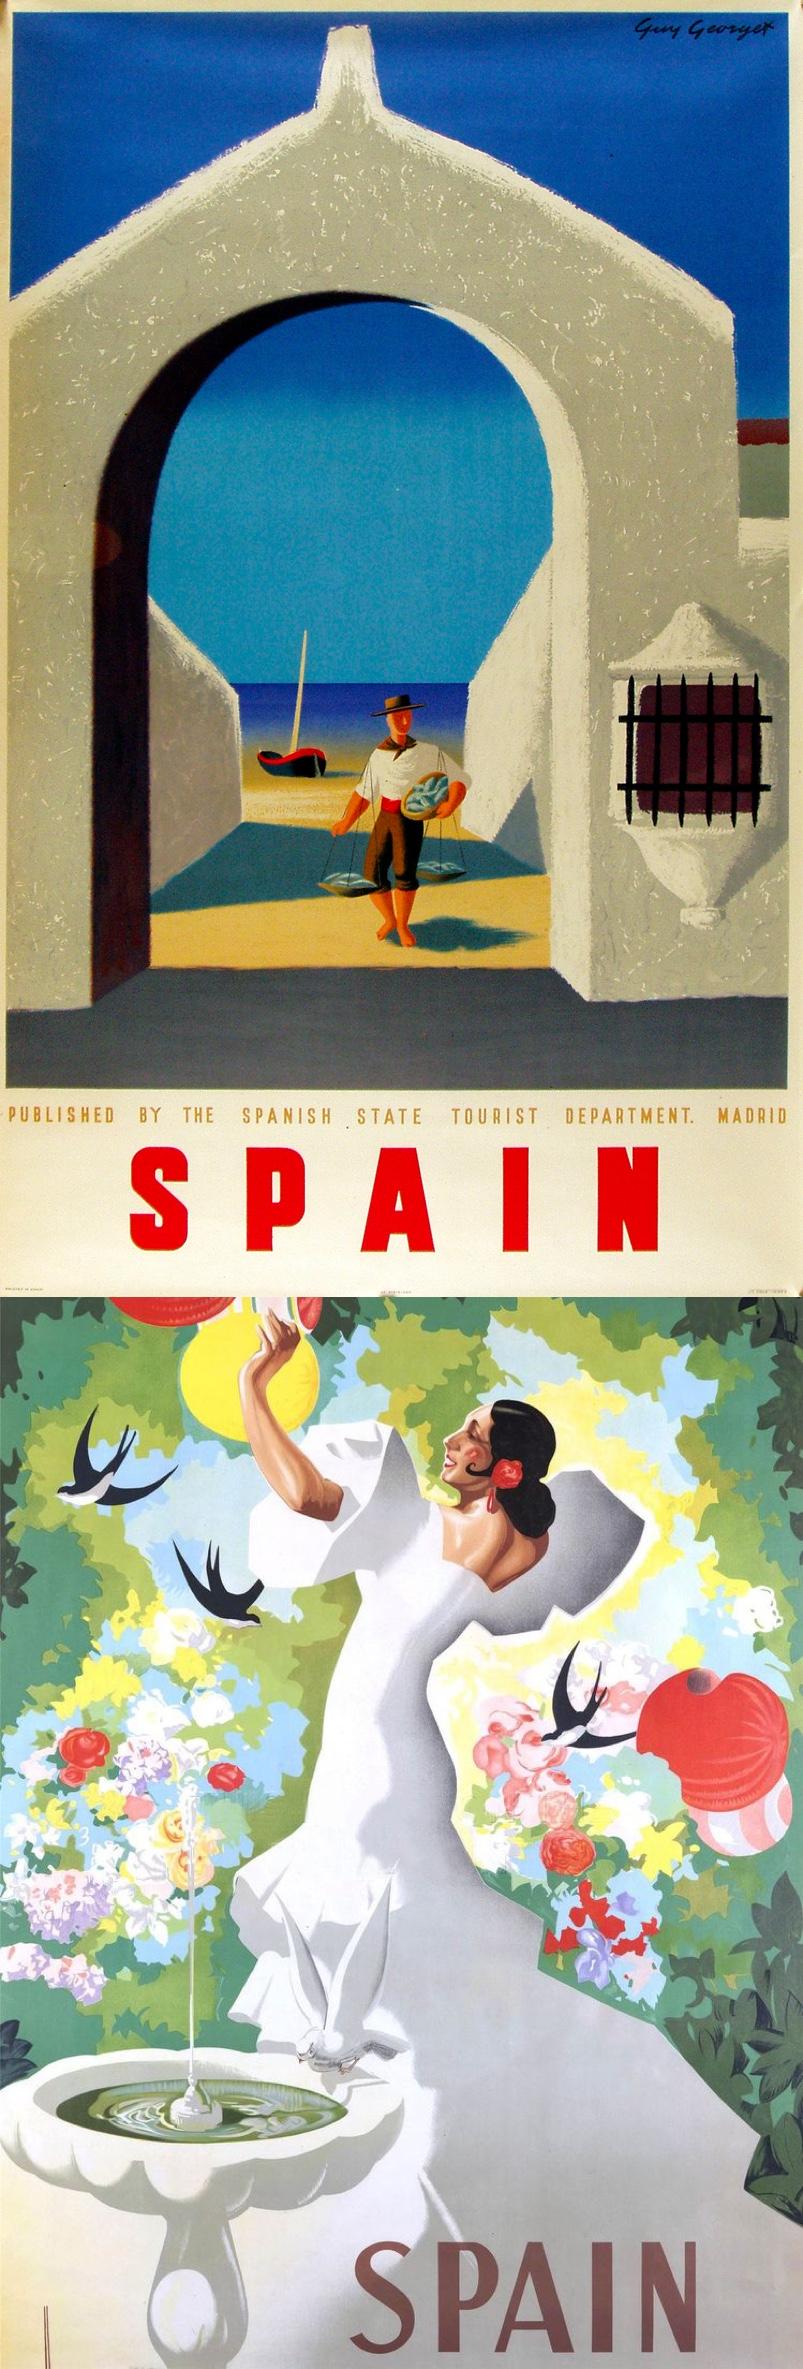 Art Deco Travel Posters Lovely Vintage Retro Holiday Tourism *Unique* Madrid